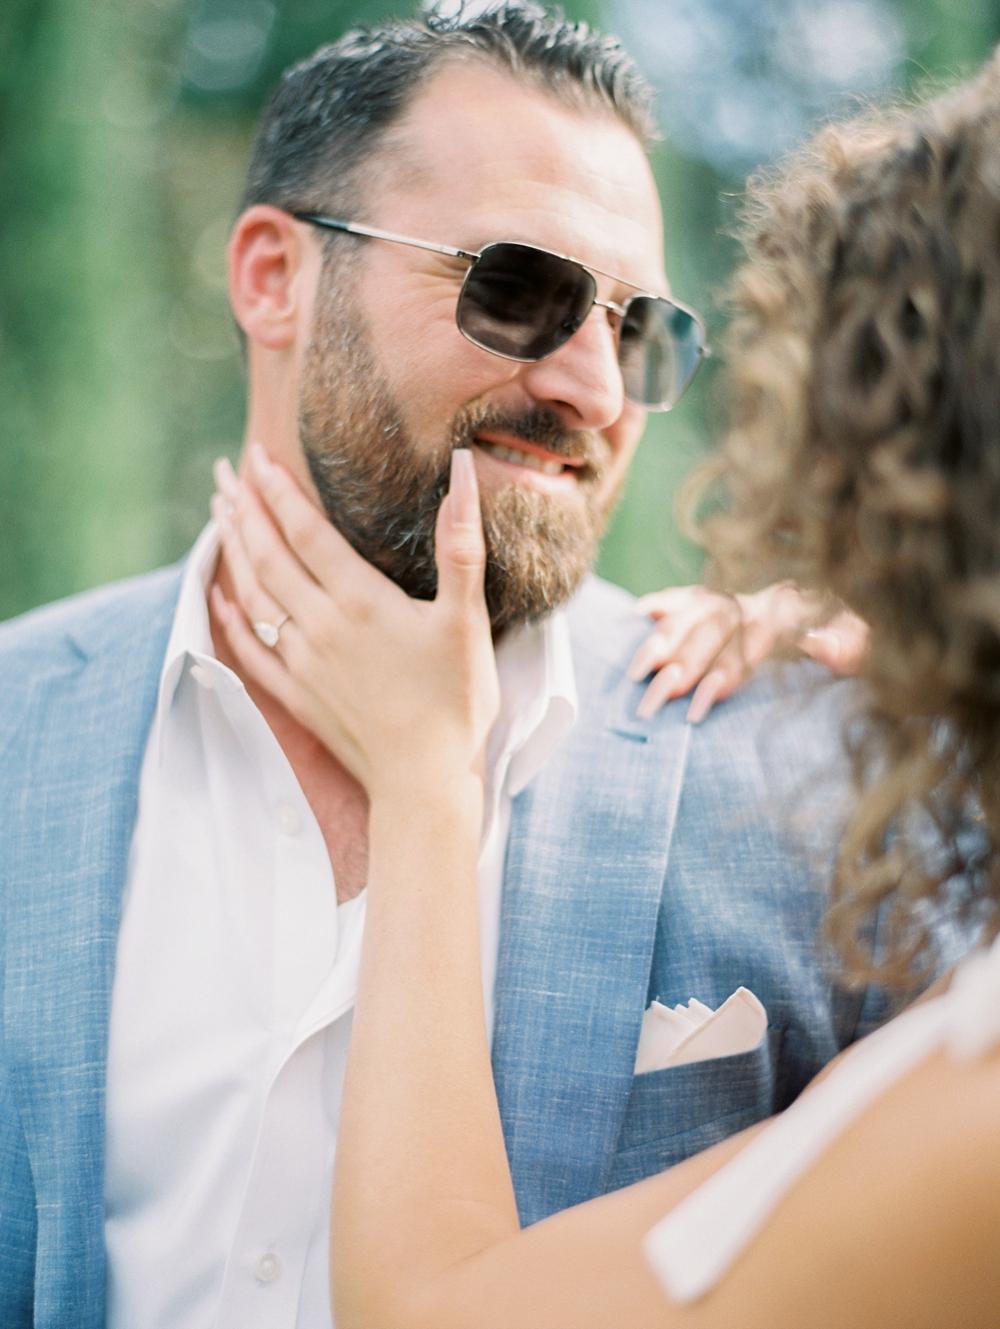 kristin-la-voie-photography-Dallas-Botanical-Garden-Arboretum-Engagement-fine-art-wedding-photographer-34